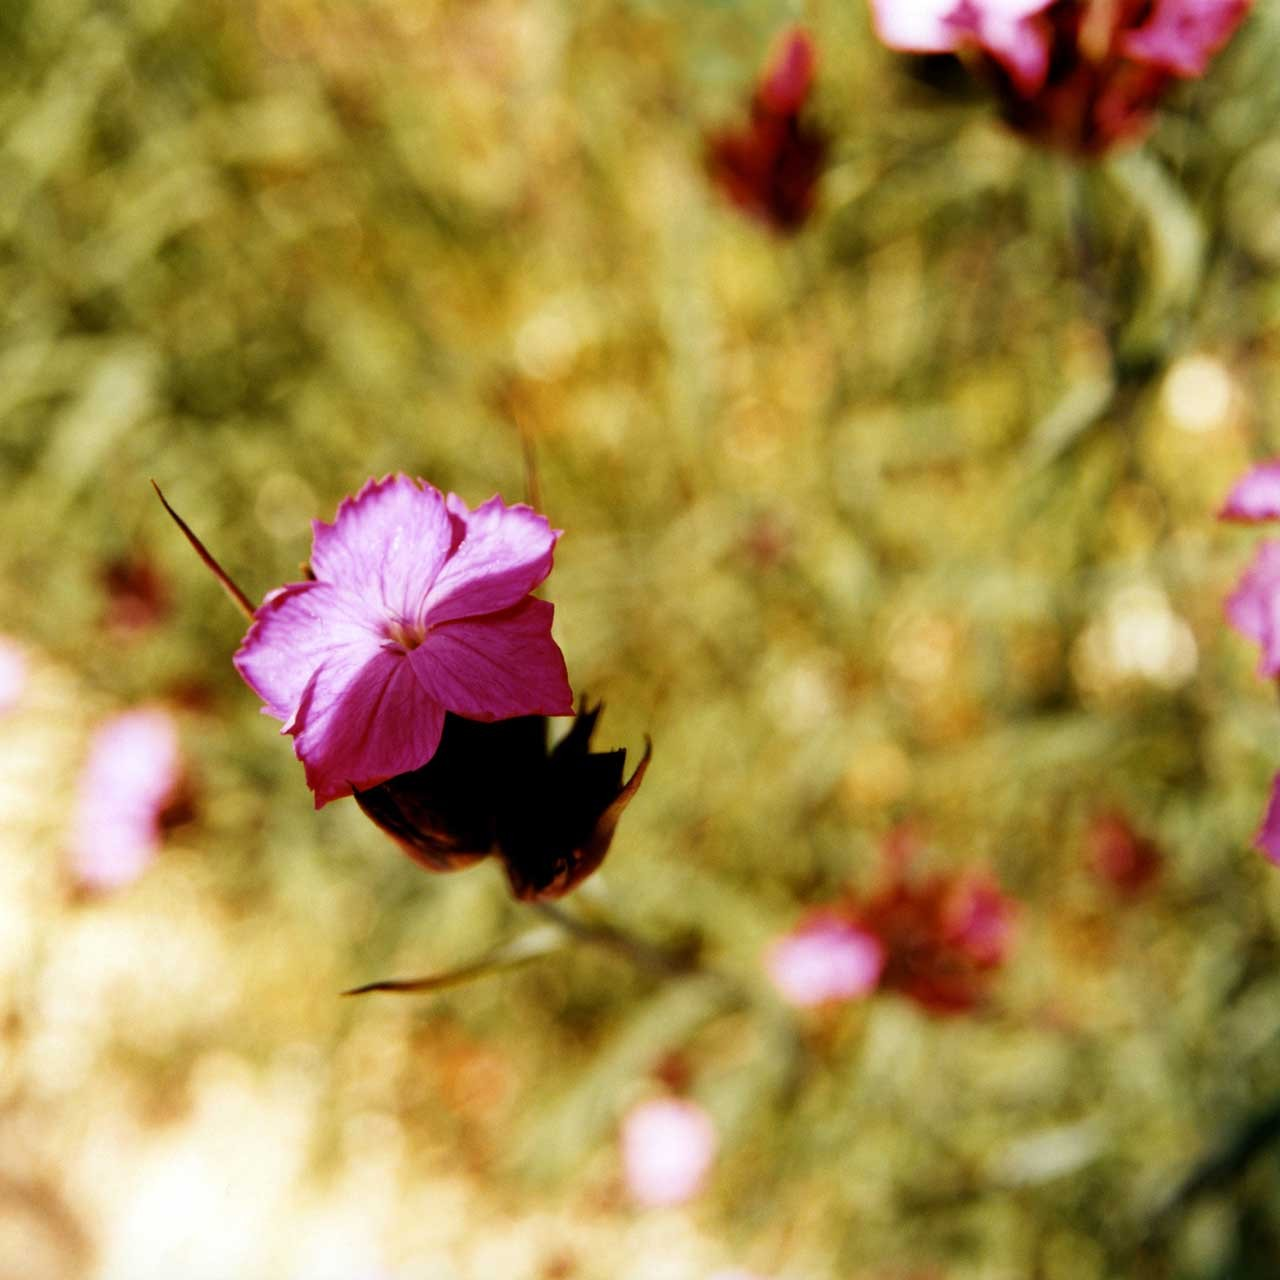 Laure-Maud_10_photographe_jardin-fleur_02